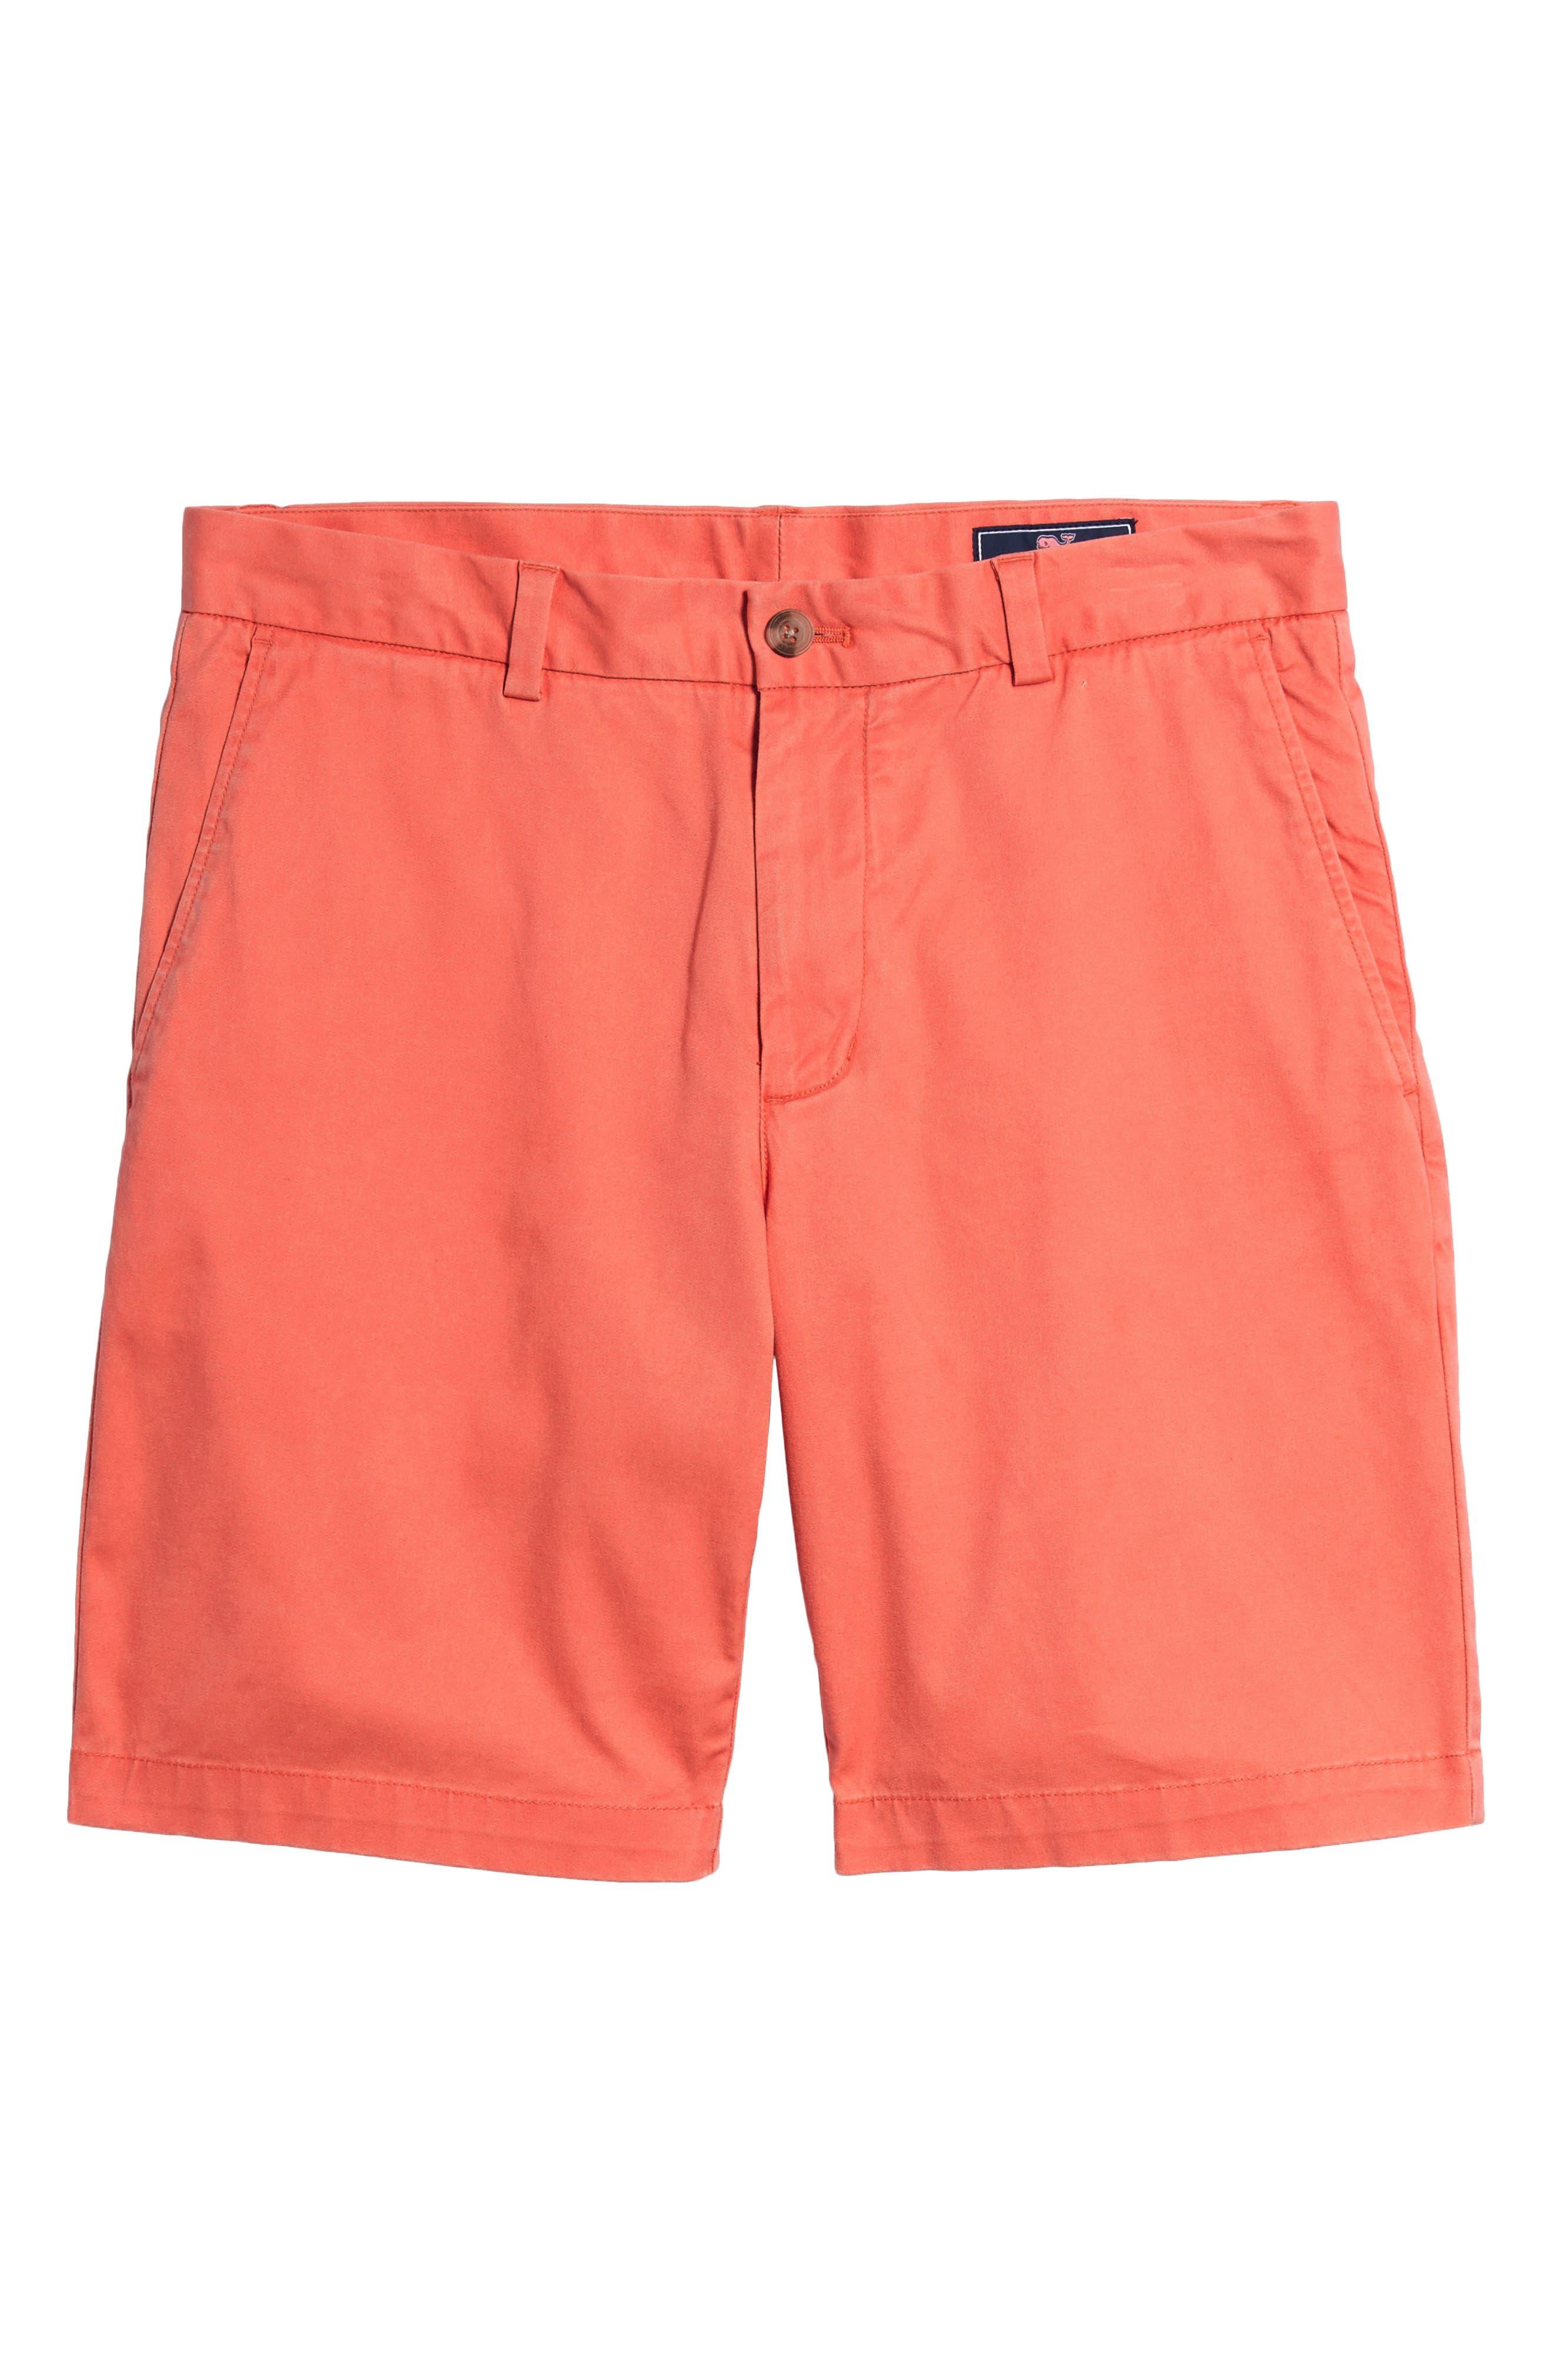 9 Inch Stretch Breaker Shorts,                             Alternate thumbnail 122, color,